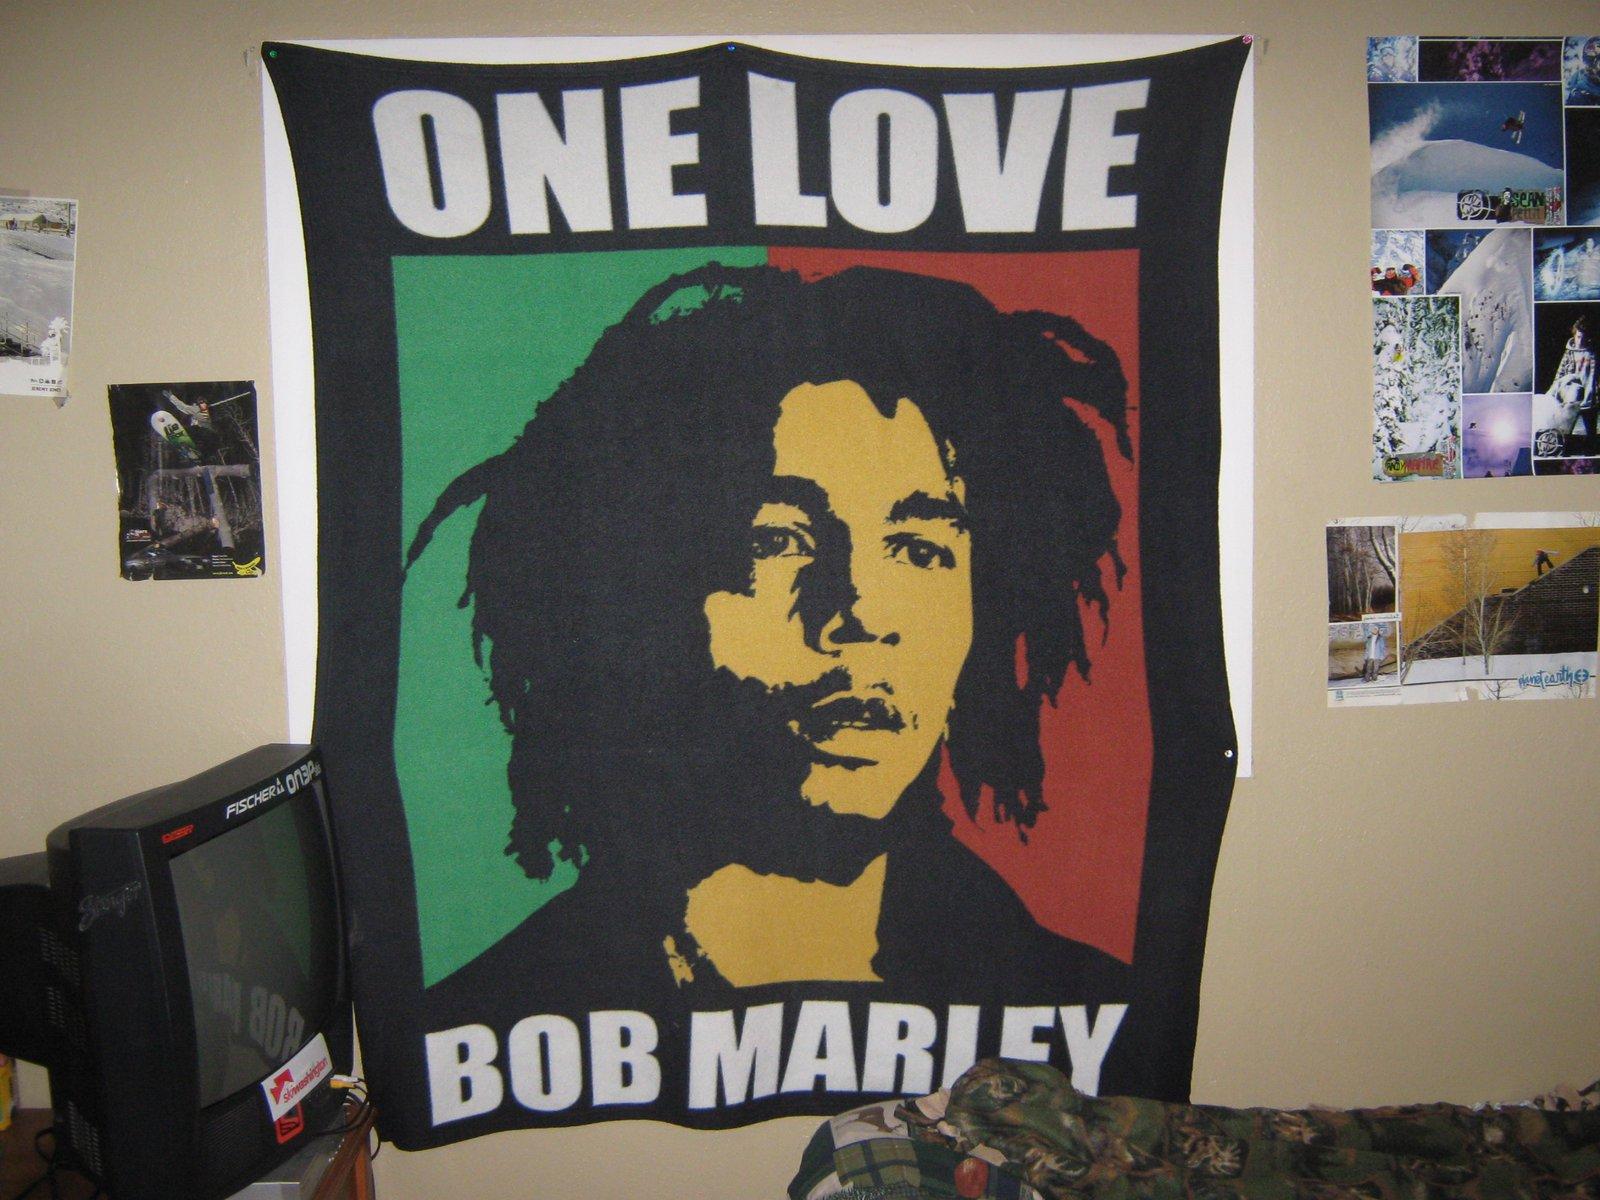 Bob marley blanket/banner